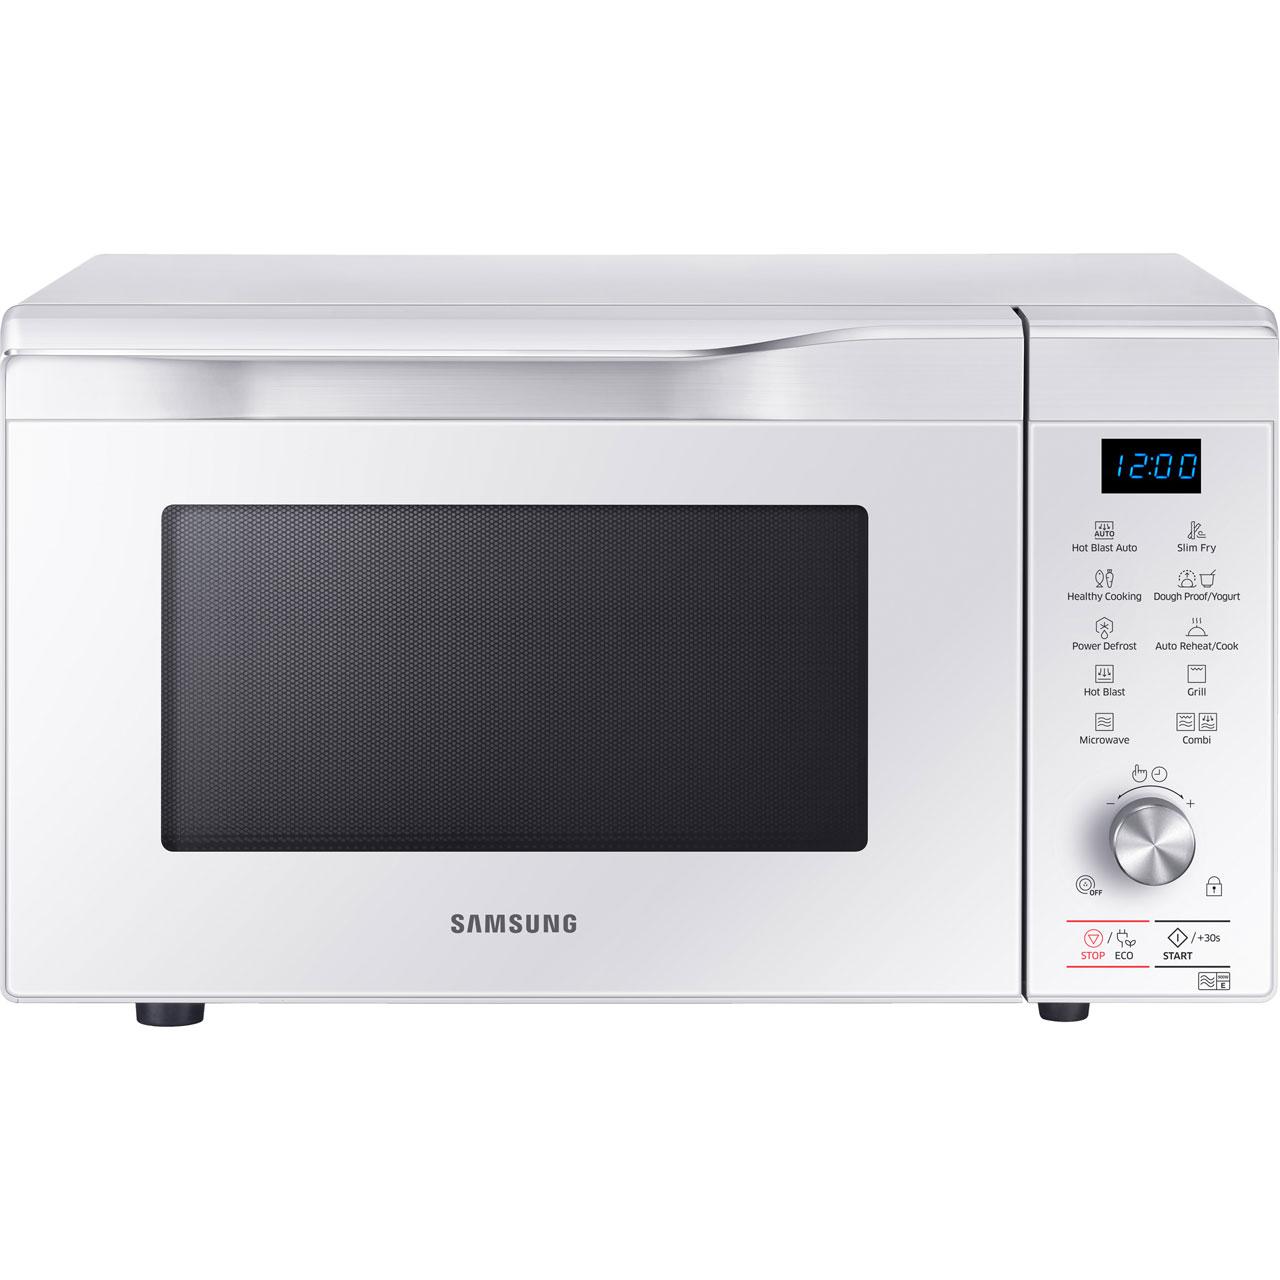 Samsung Hotblast Mc32k7055cw Microwave